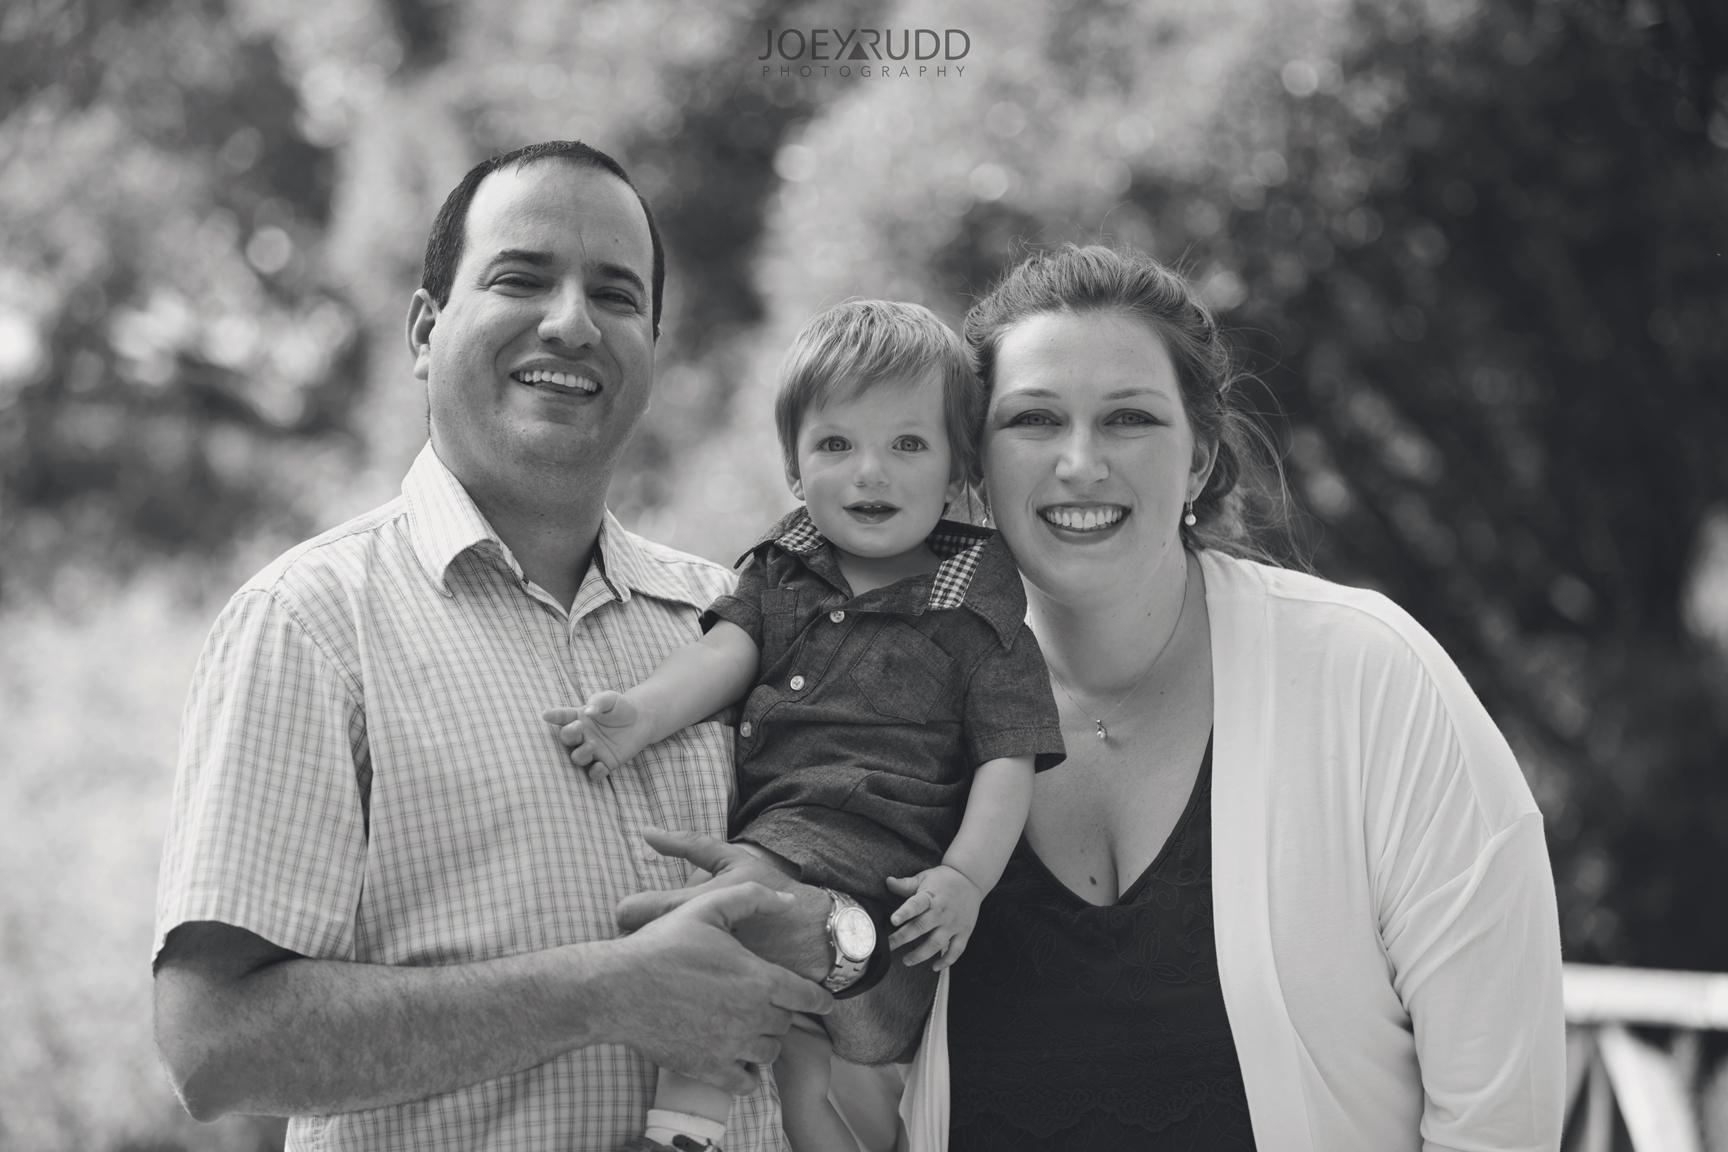 Ottawa Family Photographer Joey Rudd Photography Arboretum Black and White